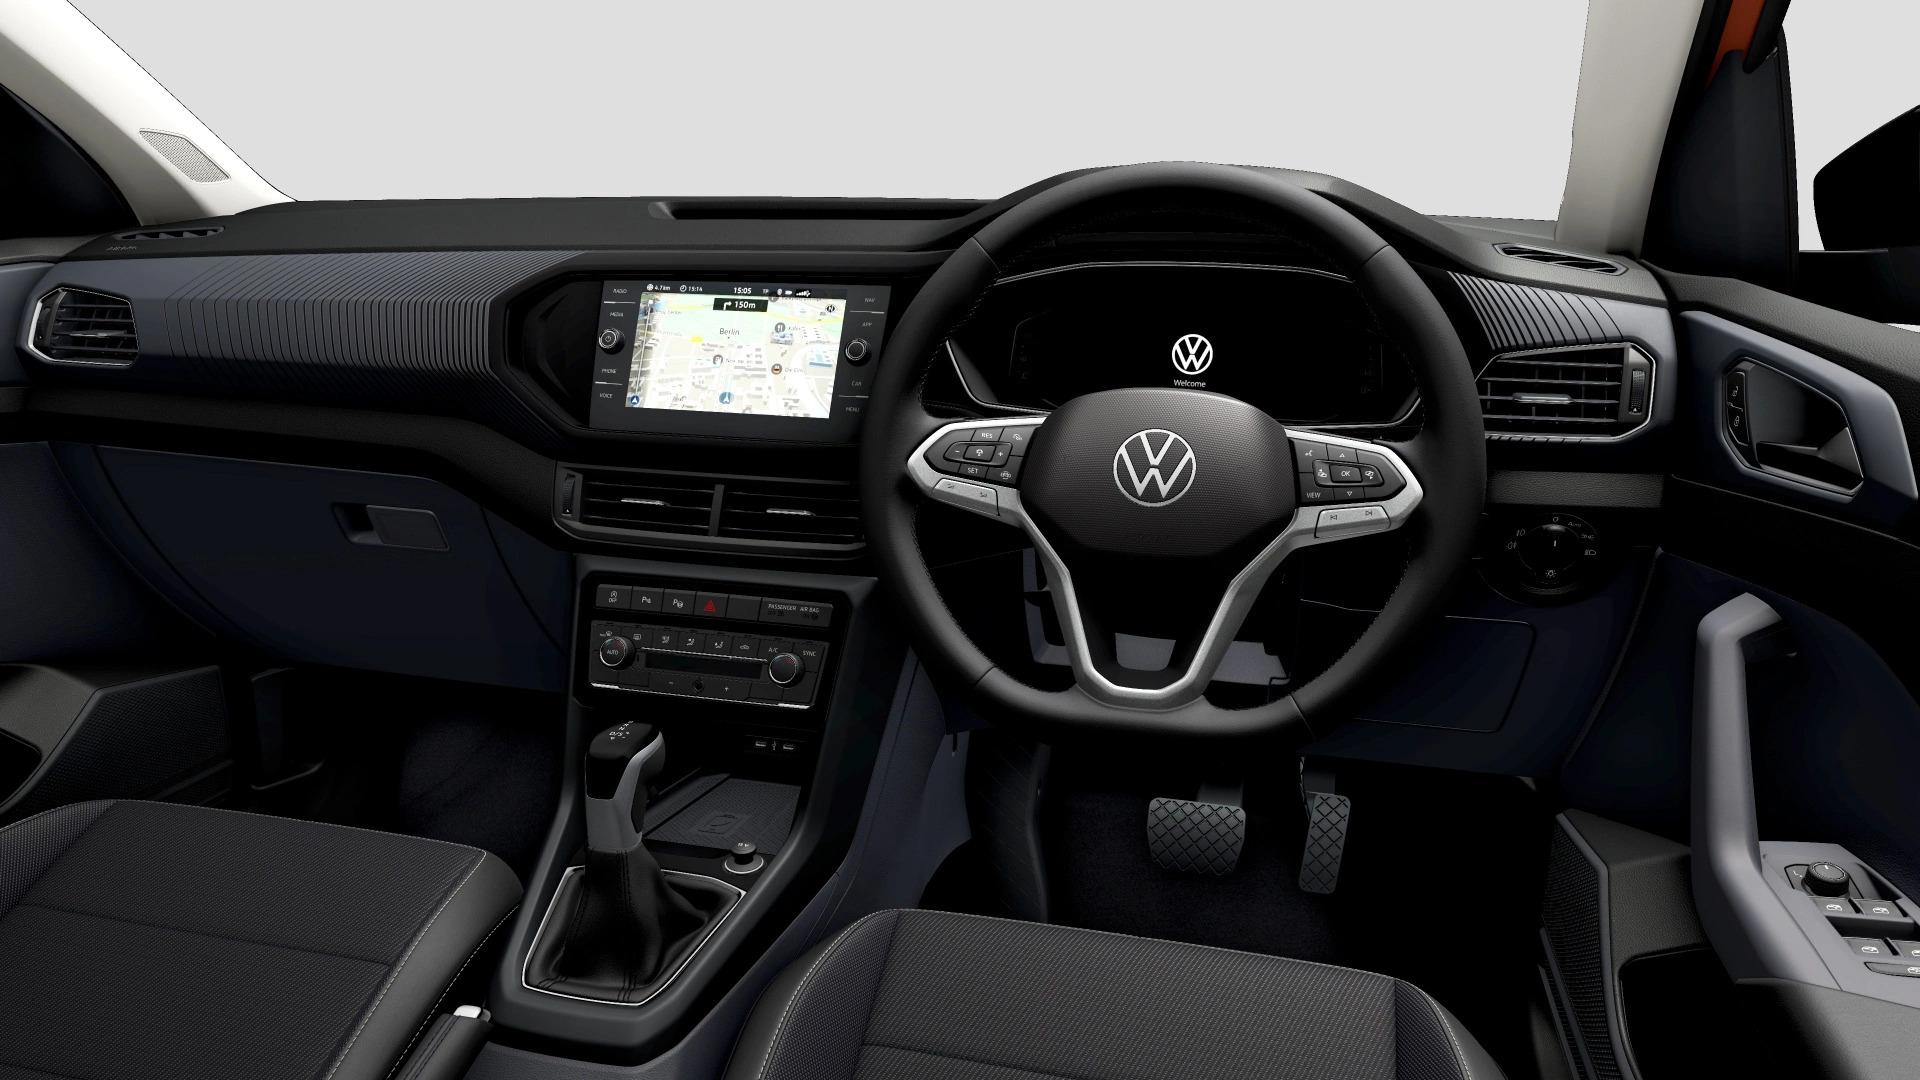 T-Cross TSI Style デザインパッケージ、 Discover Media パッケージ、セーフティパッケージ、 テクノロジーパッケージ装着車の画像4